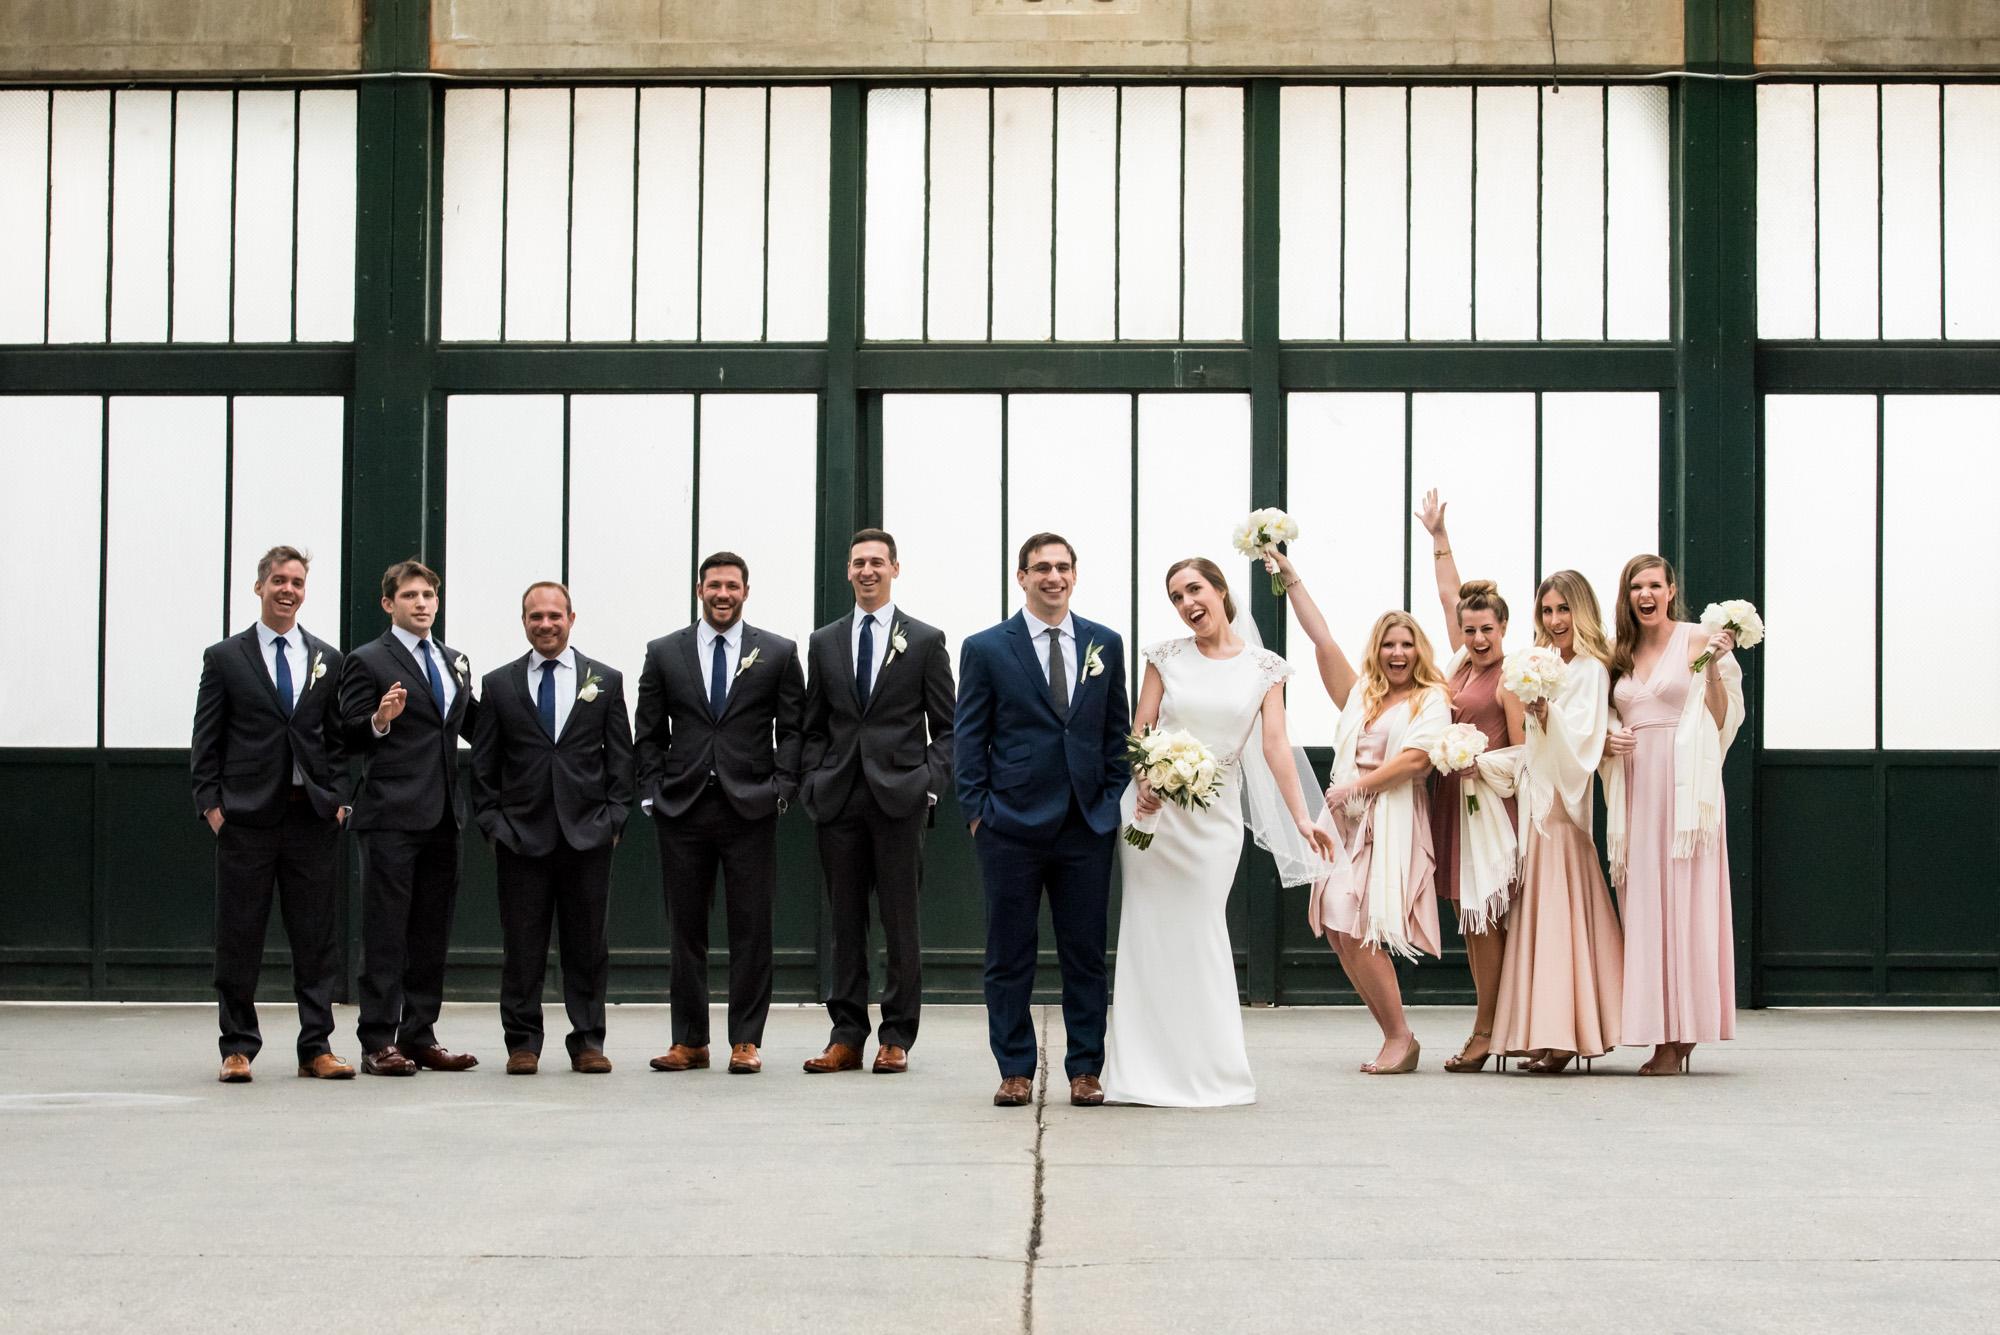 nj-wedding-photographer-maritime-parc-maria-david-22.jpg